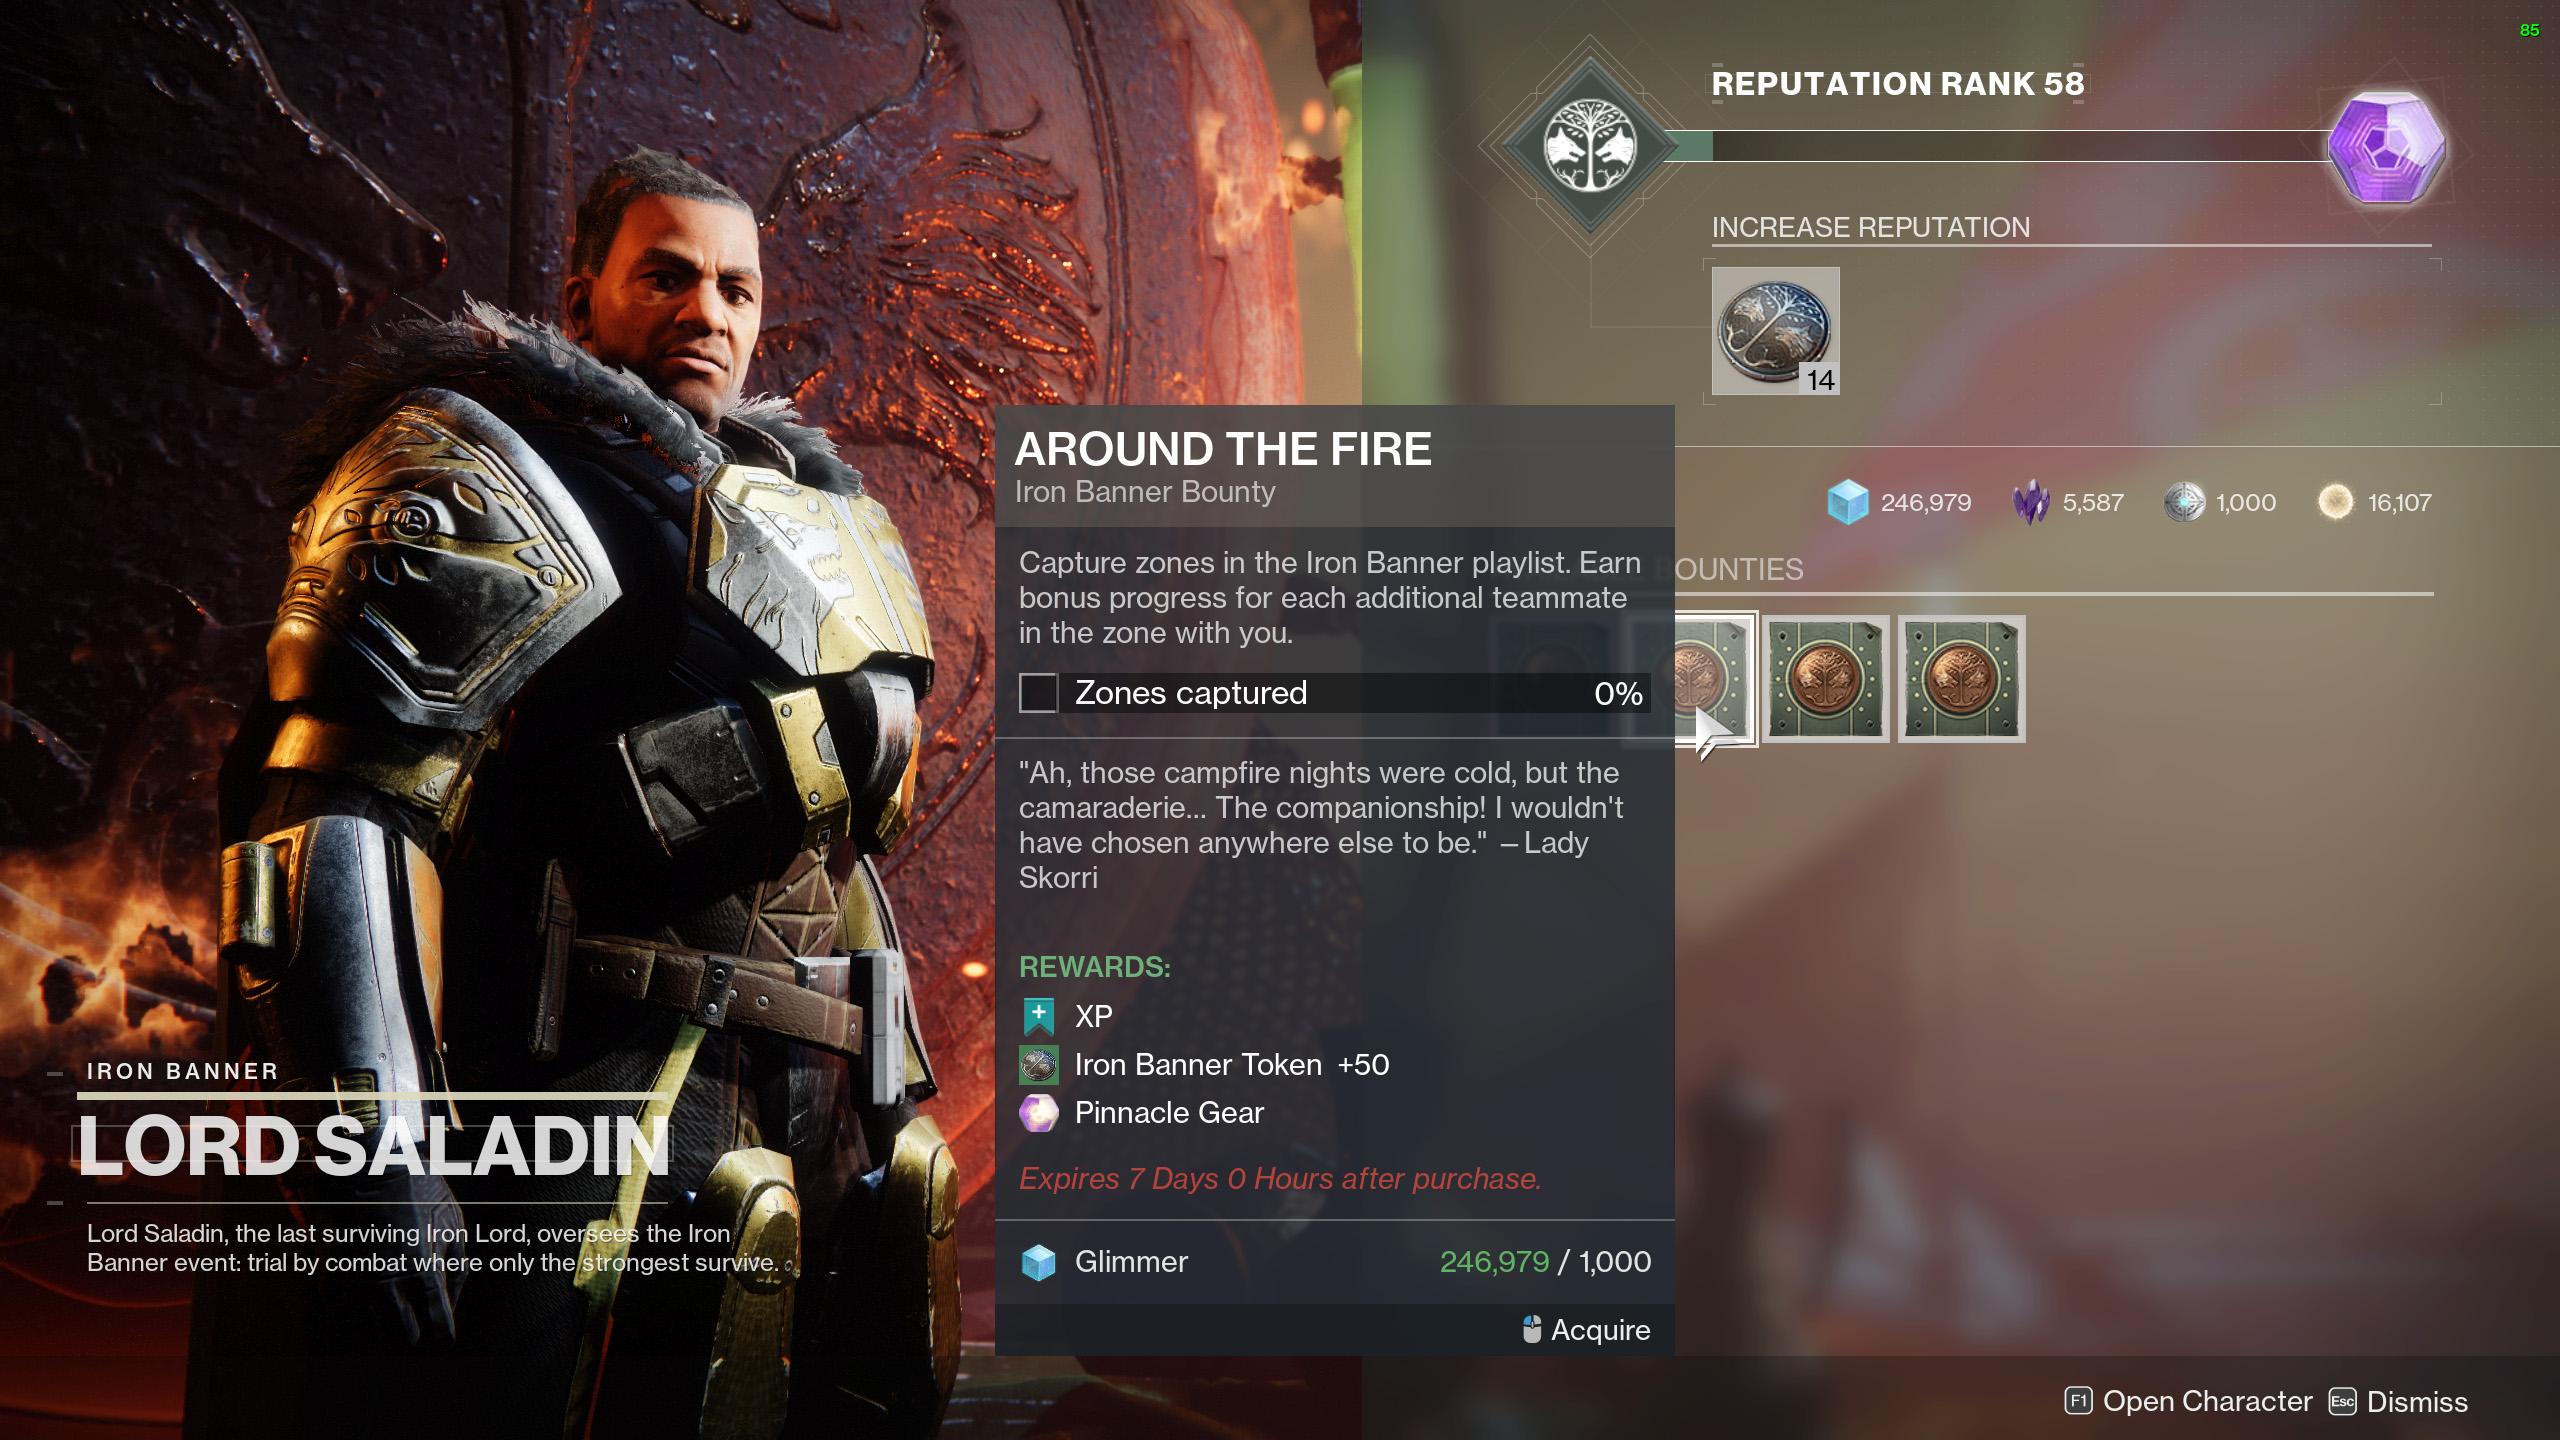 destiny 2 iron banner season 14 bounties around the fire